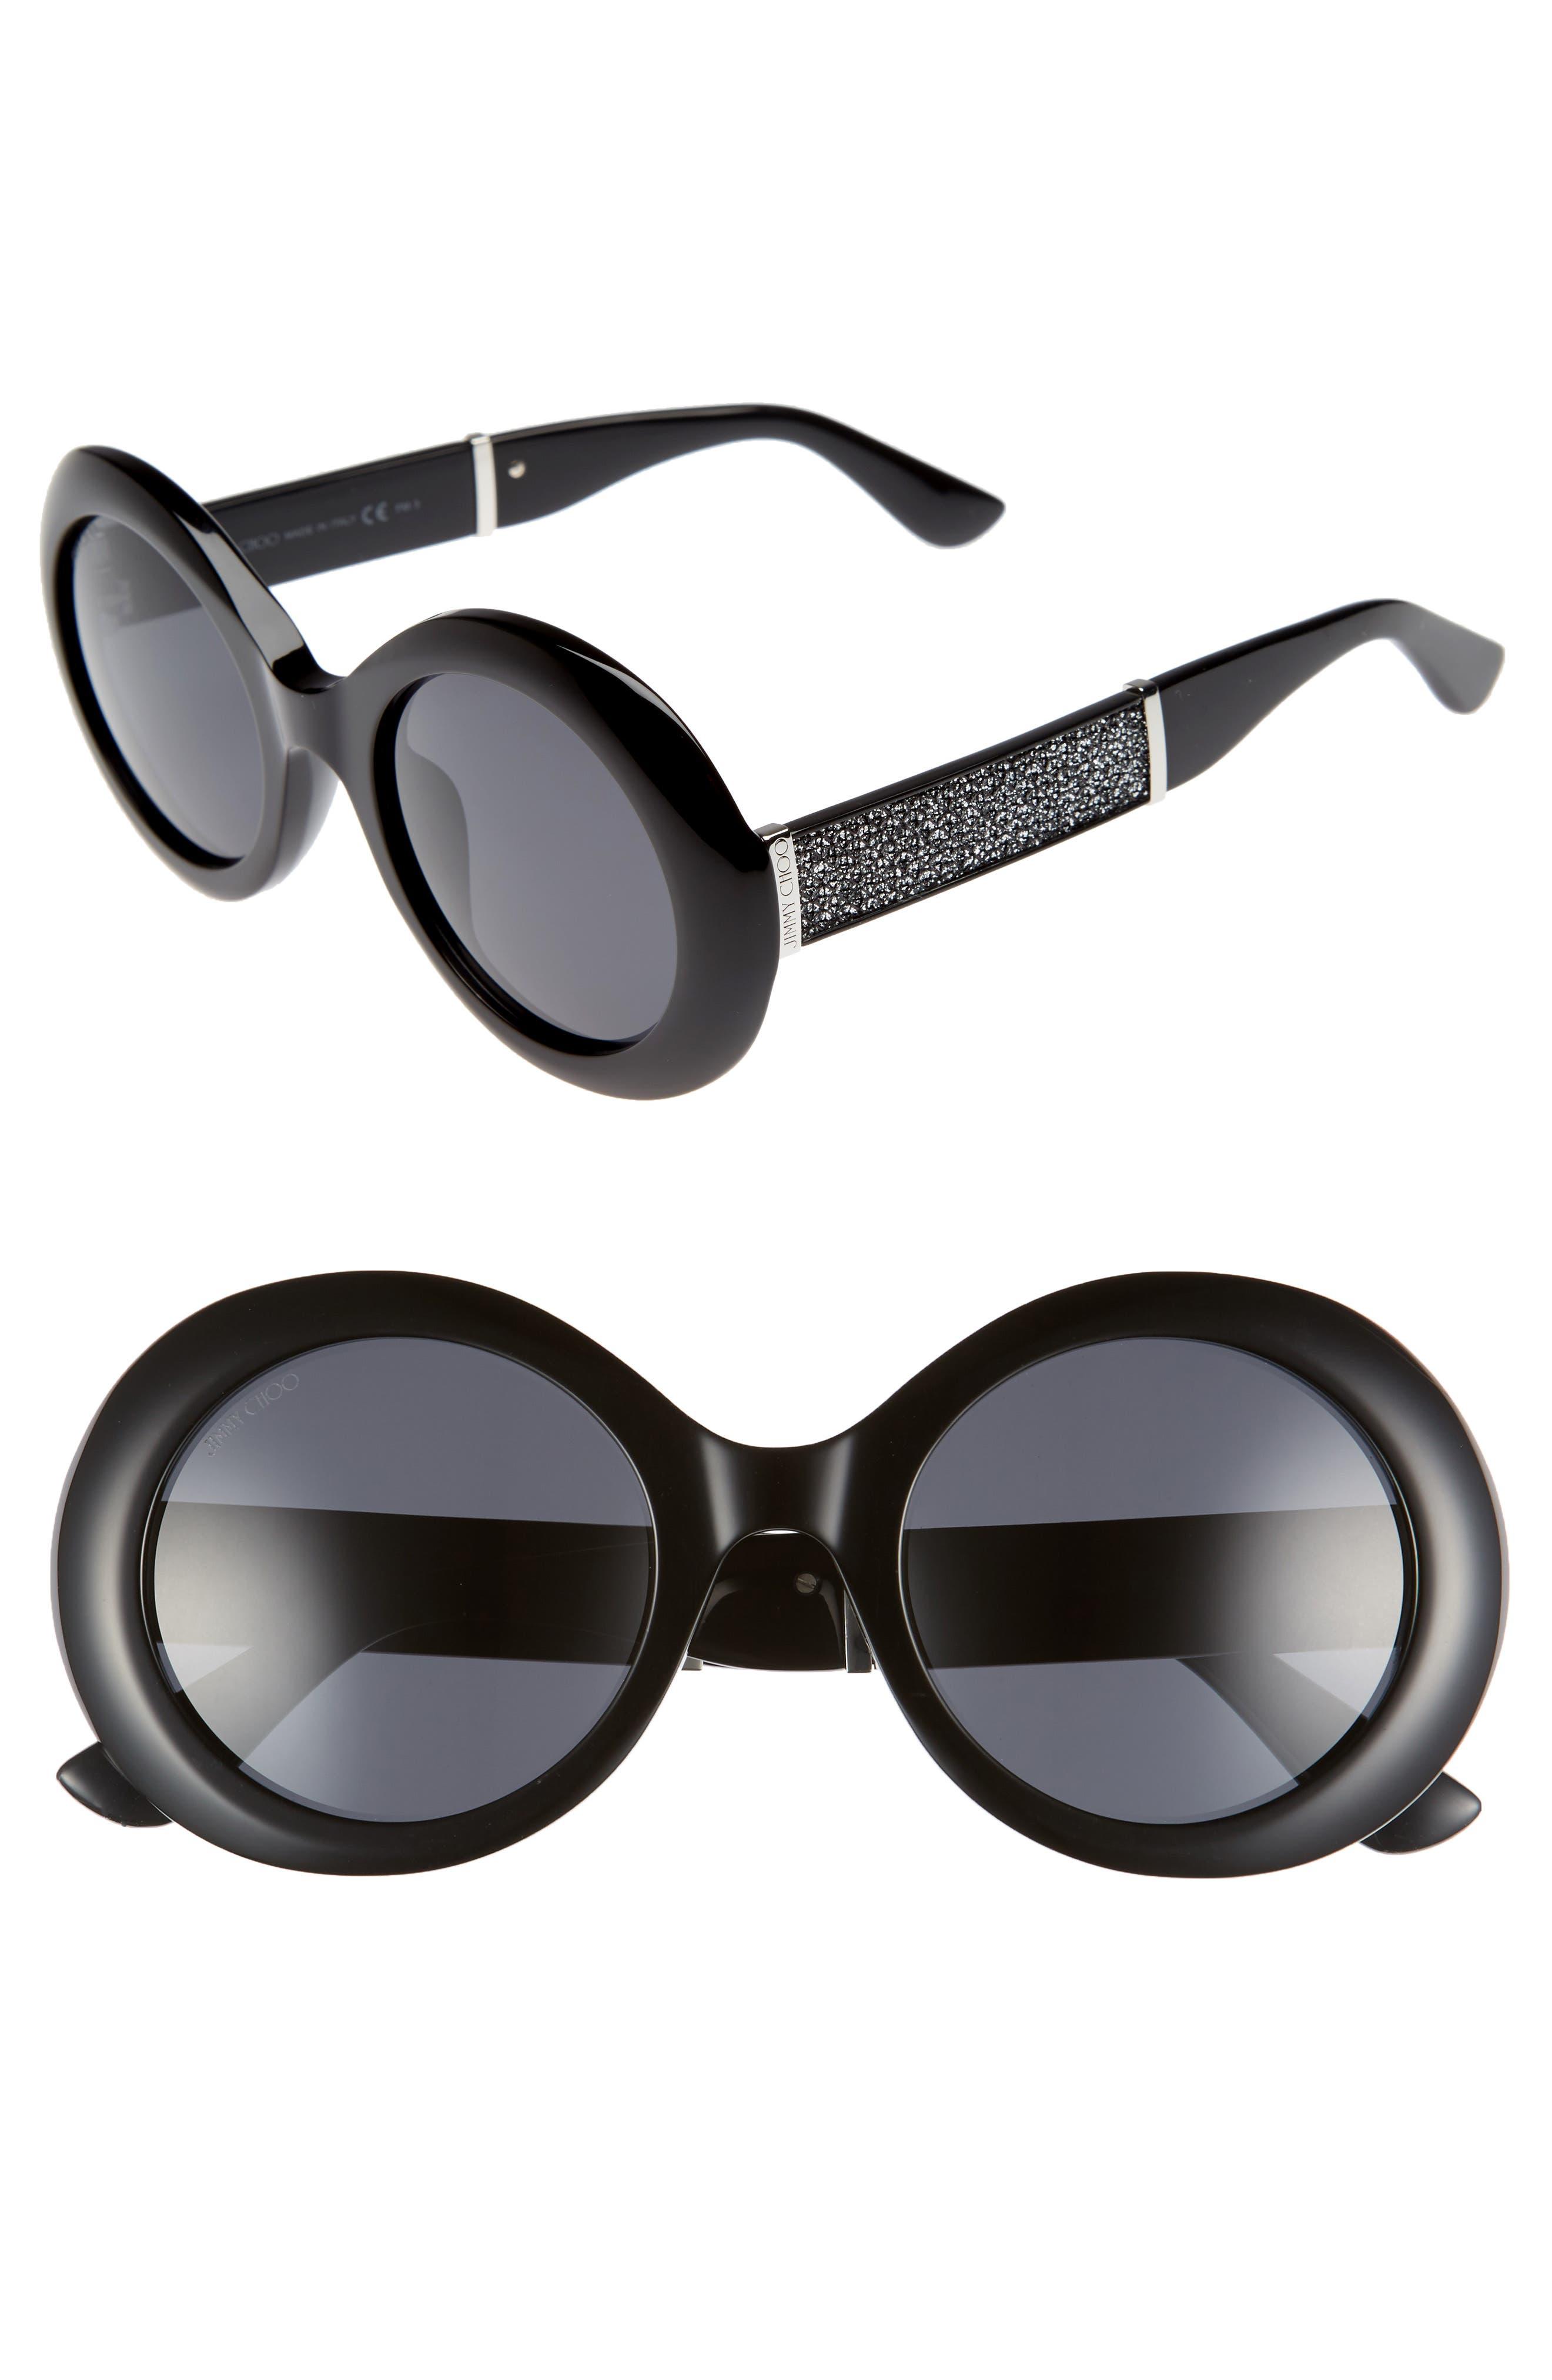 Wendy 51mm Round Sunglasses,                             Main thumbnail 1, color,                             Black/ Glitter/ Black